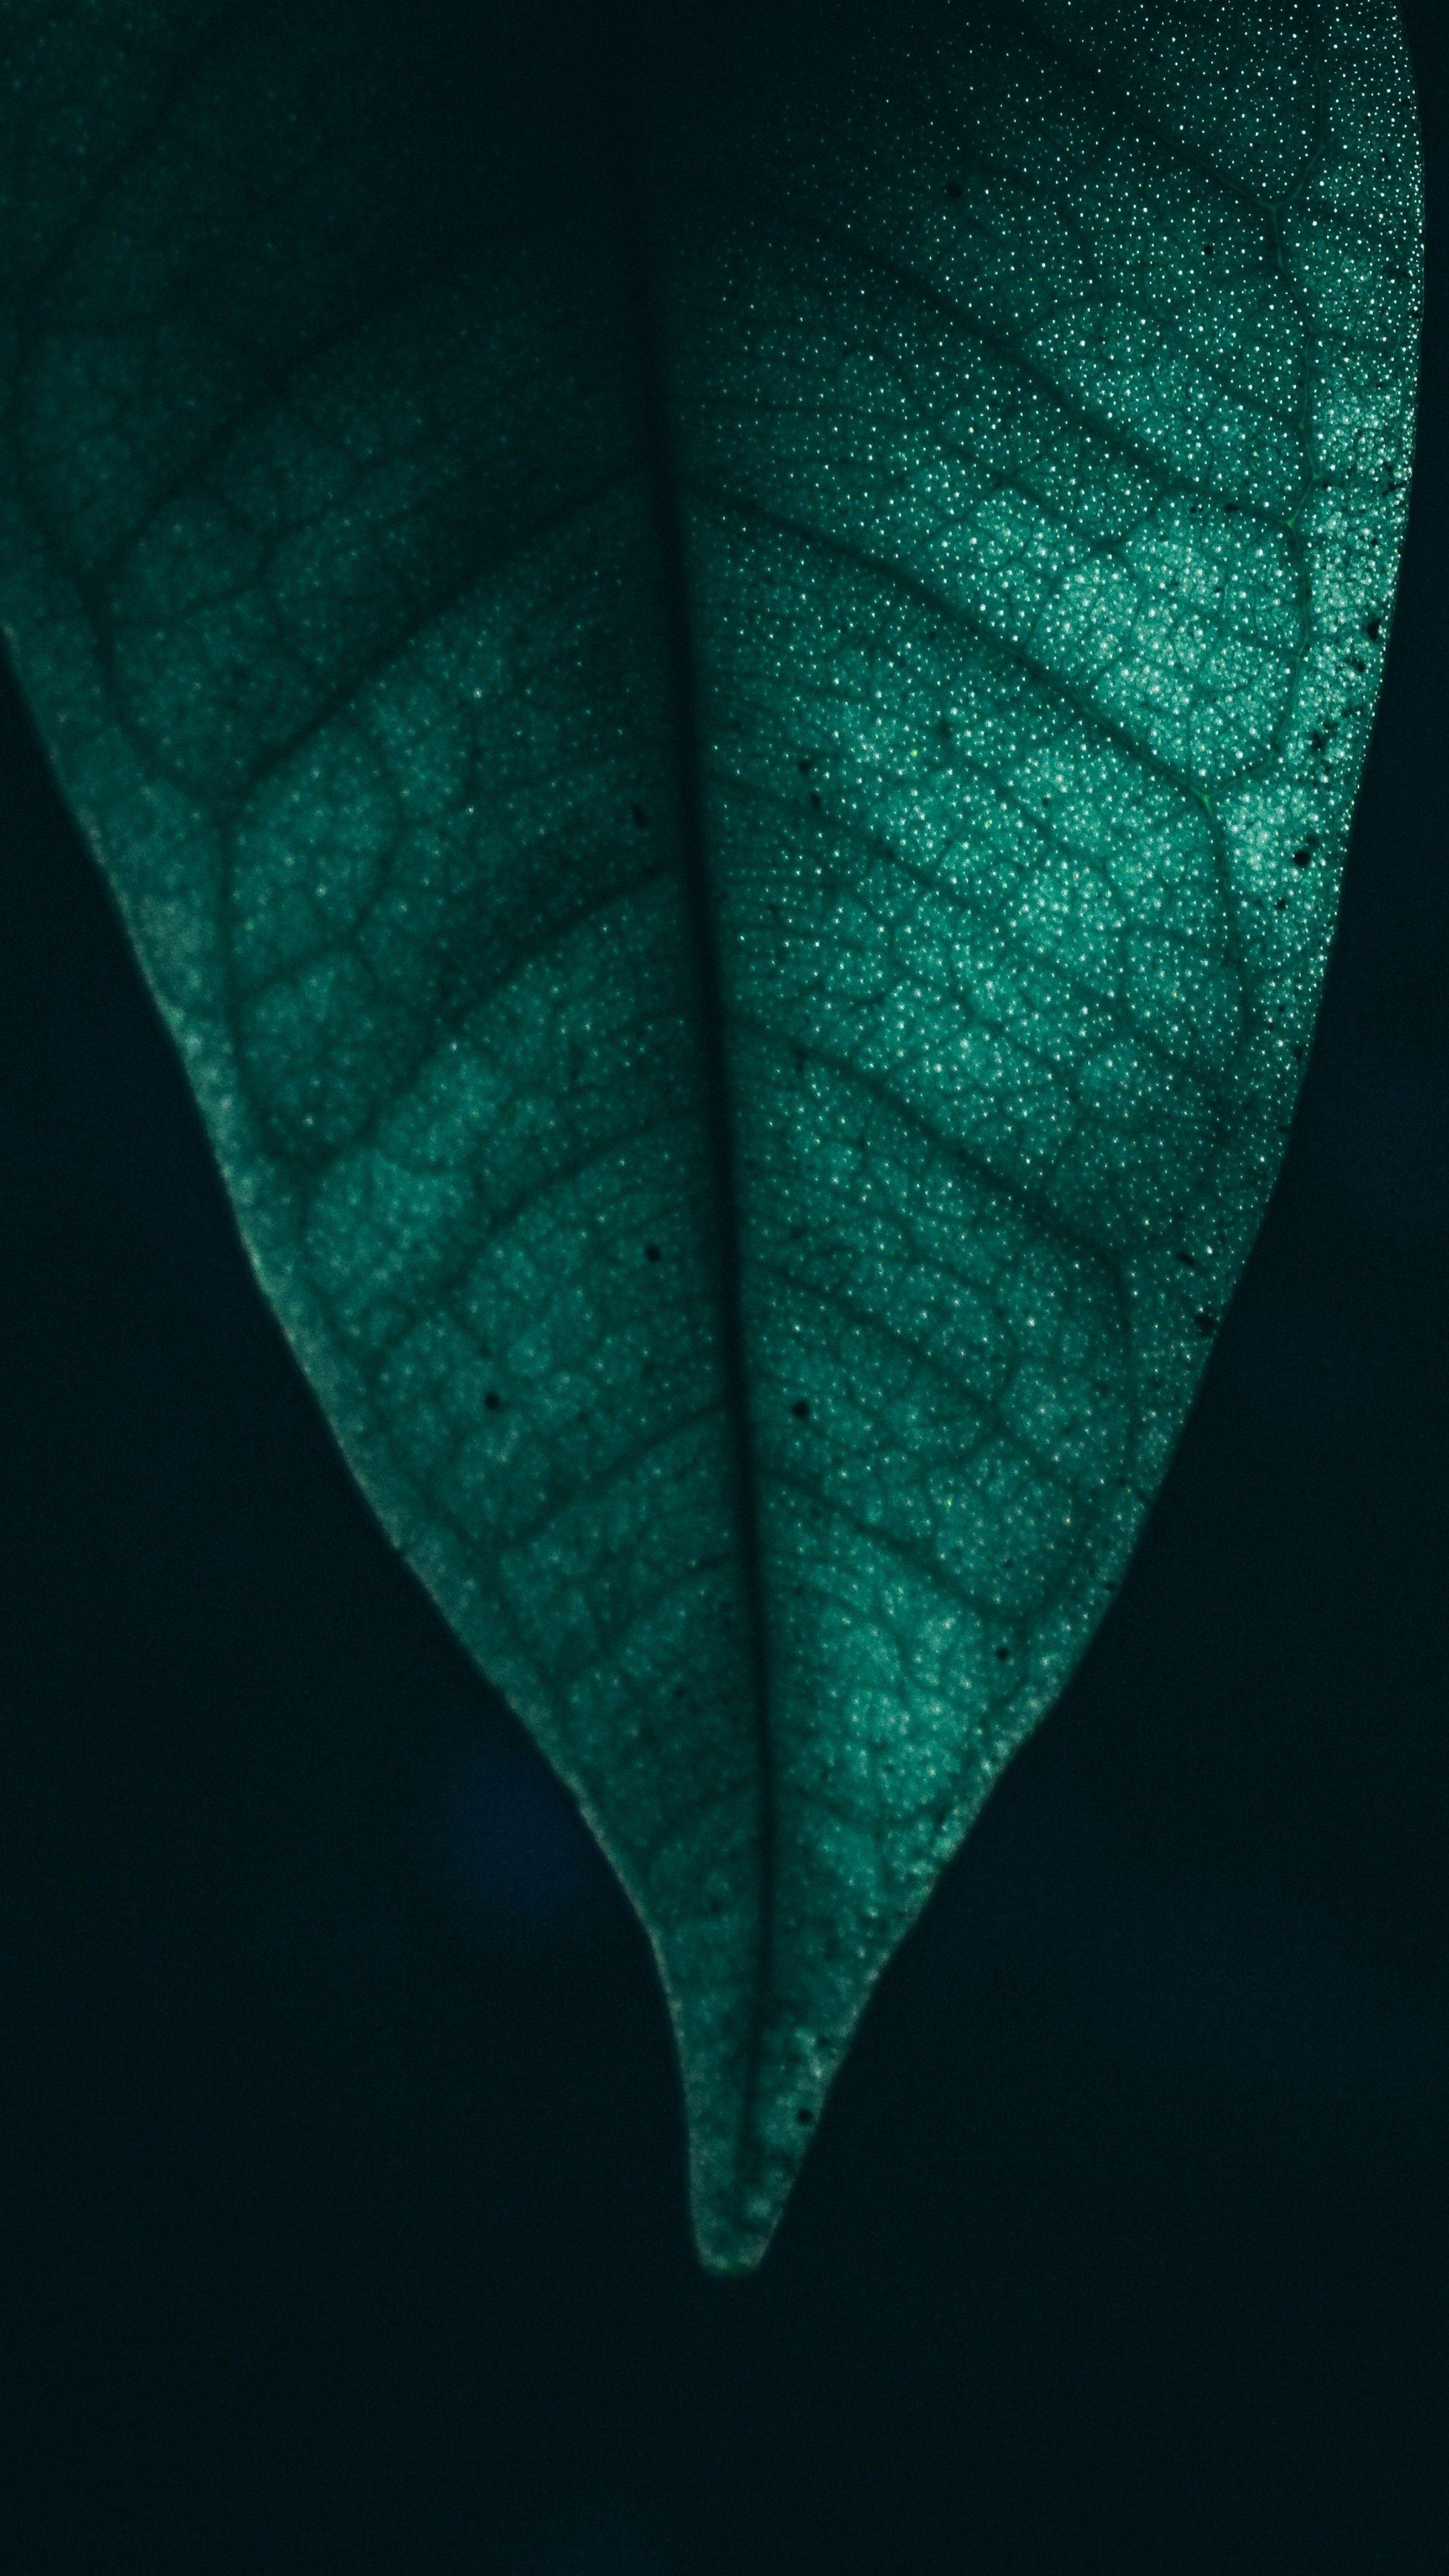 Nature Green Leaf Macro 4k Wallpapers Hd 4k Background For Android Wallpapers 4kwallpaper Android Wallpaper 4k Background Backgrounds For Android